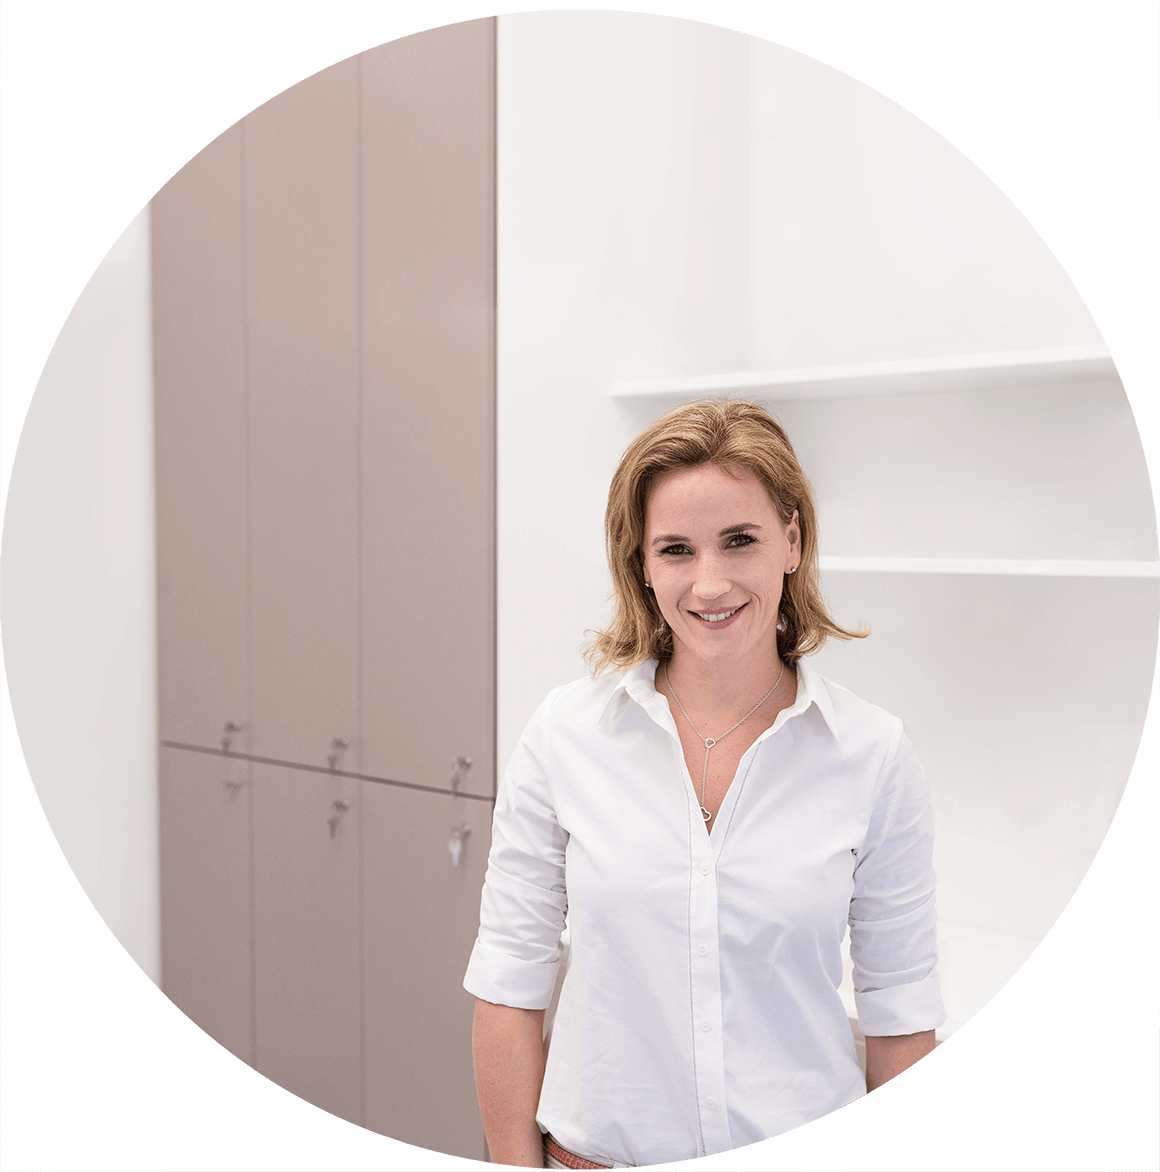 Dr. Elisabeth Rosenbaum-Medani